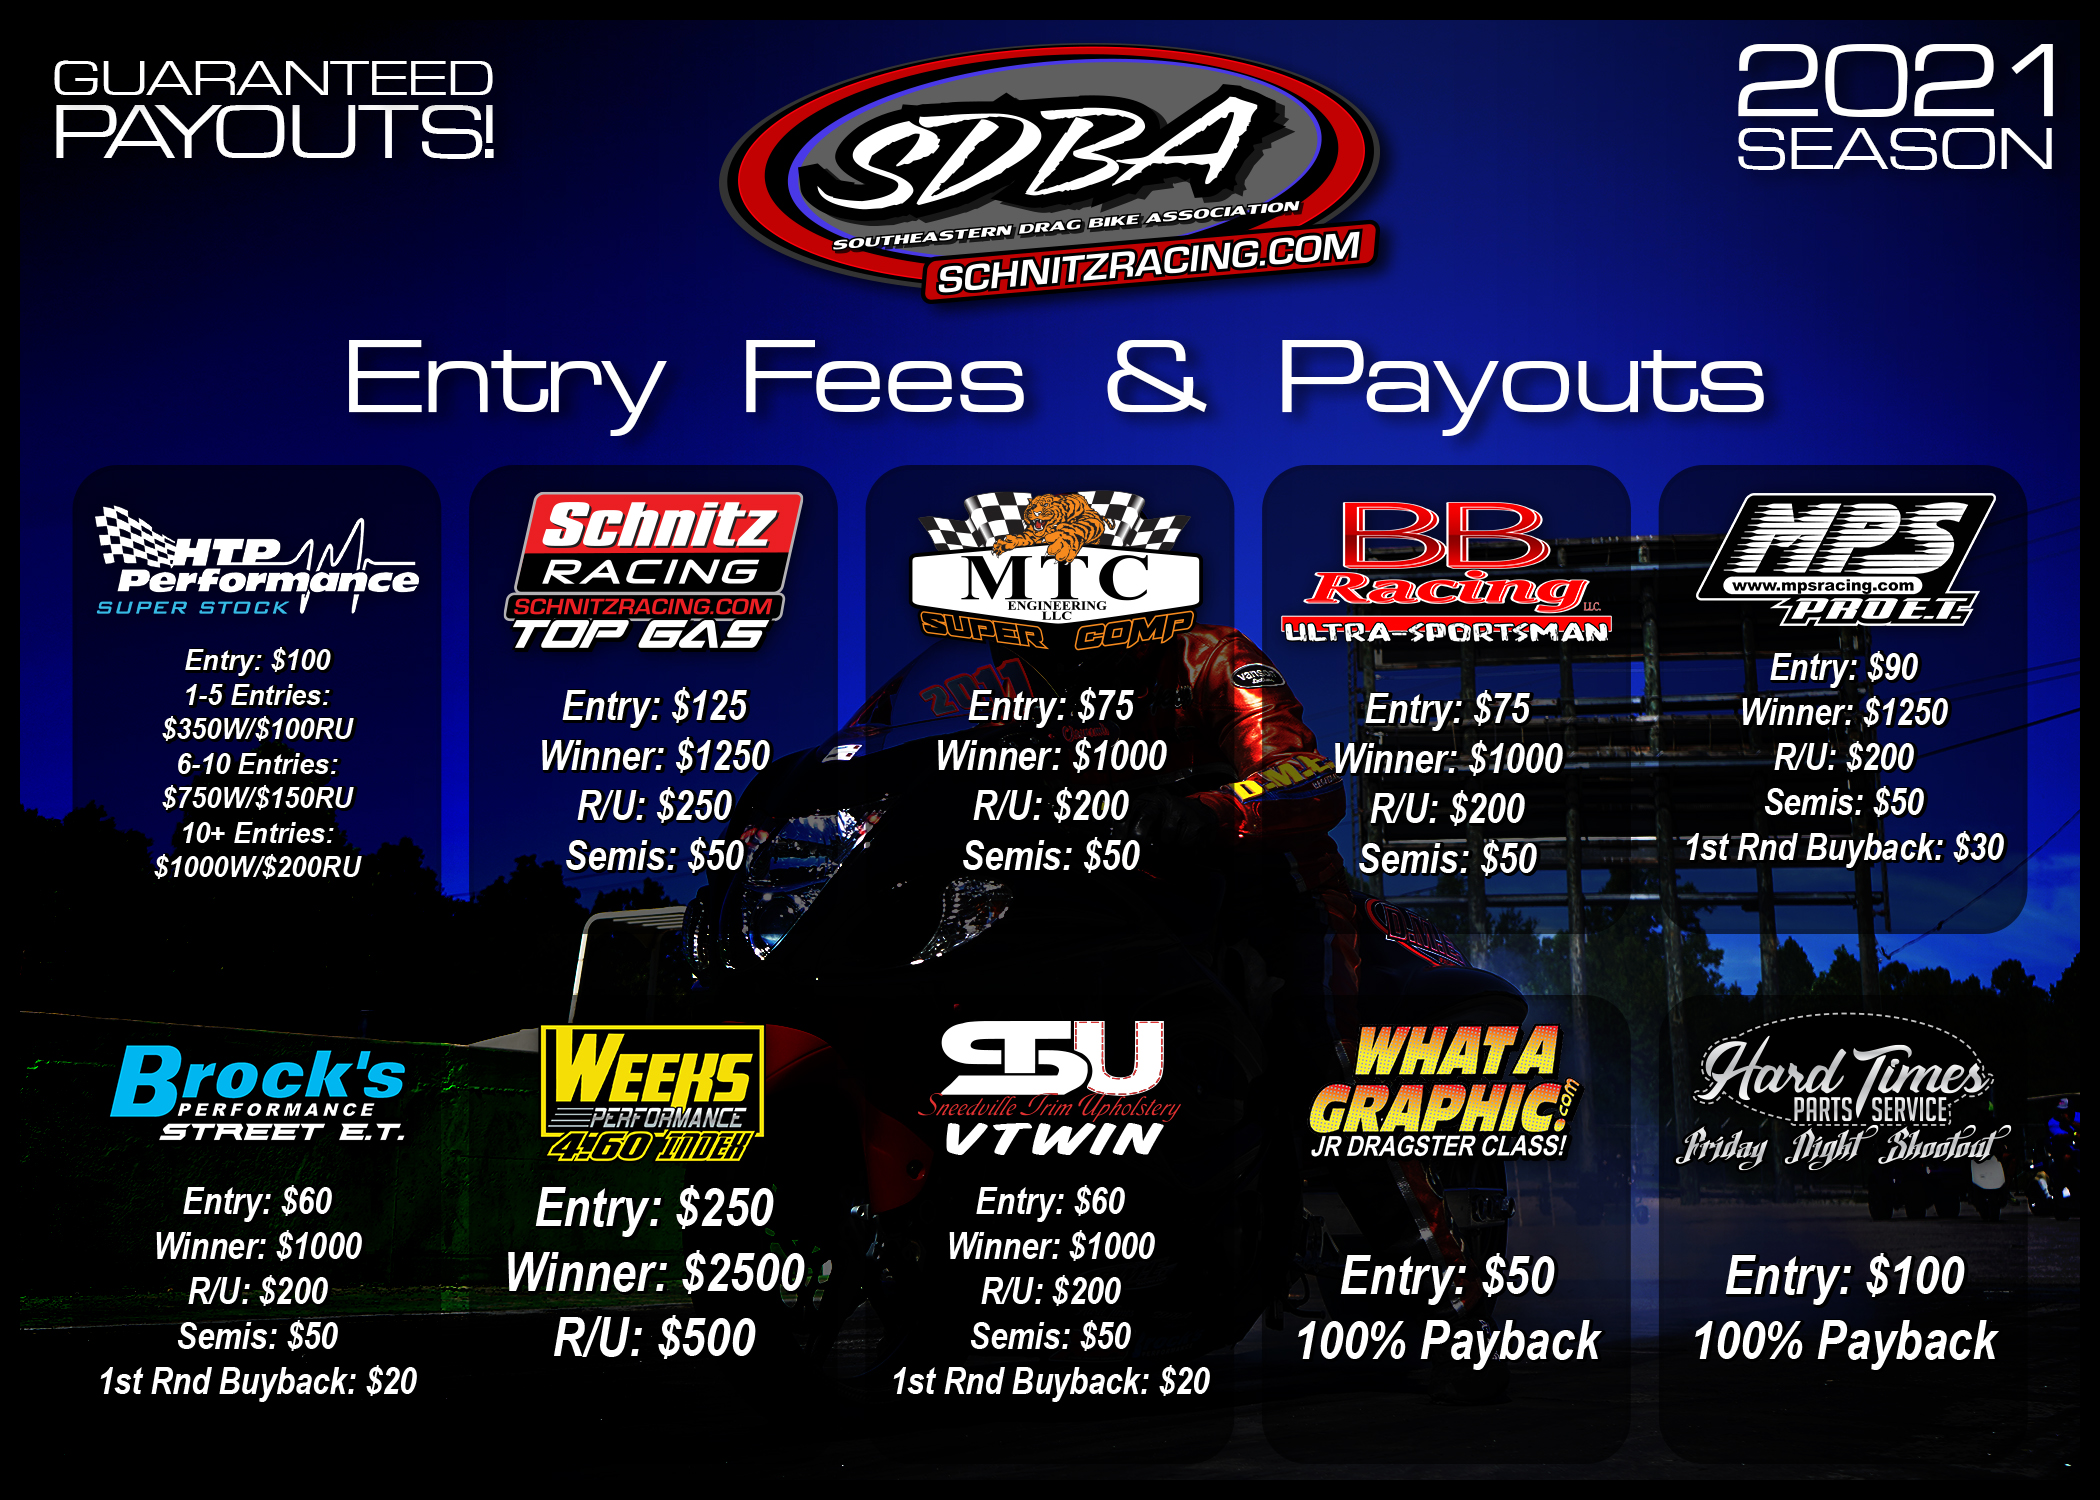 SDBA 2021 Schedule Flyer